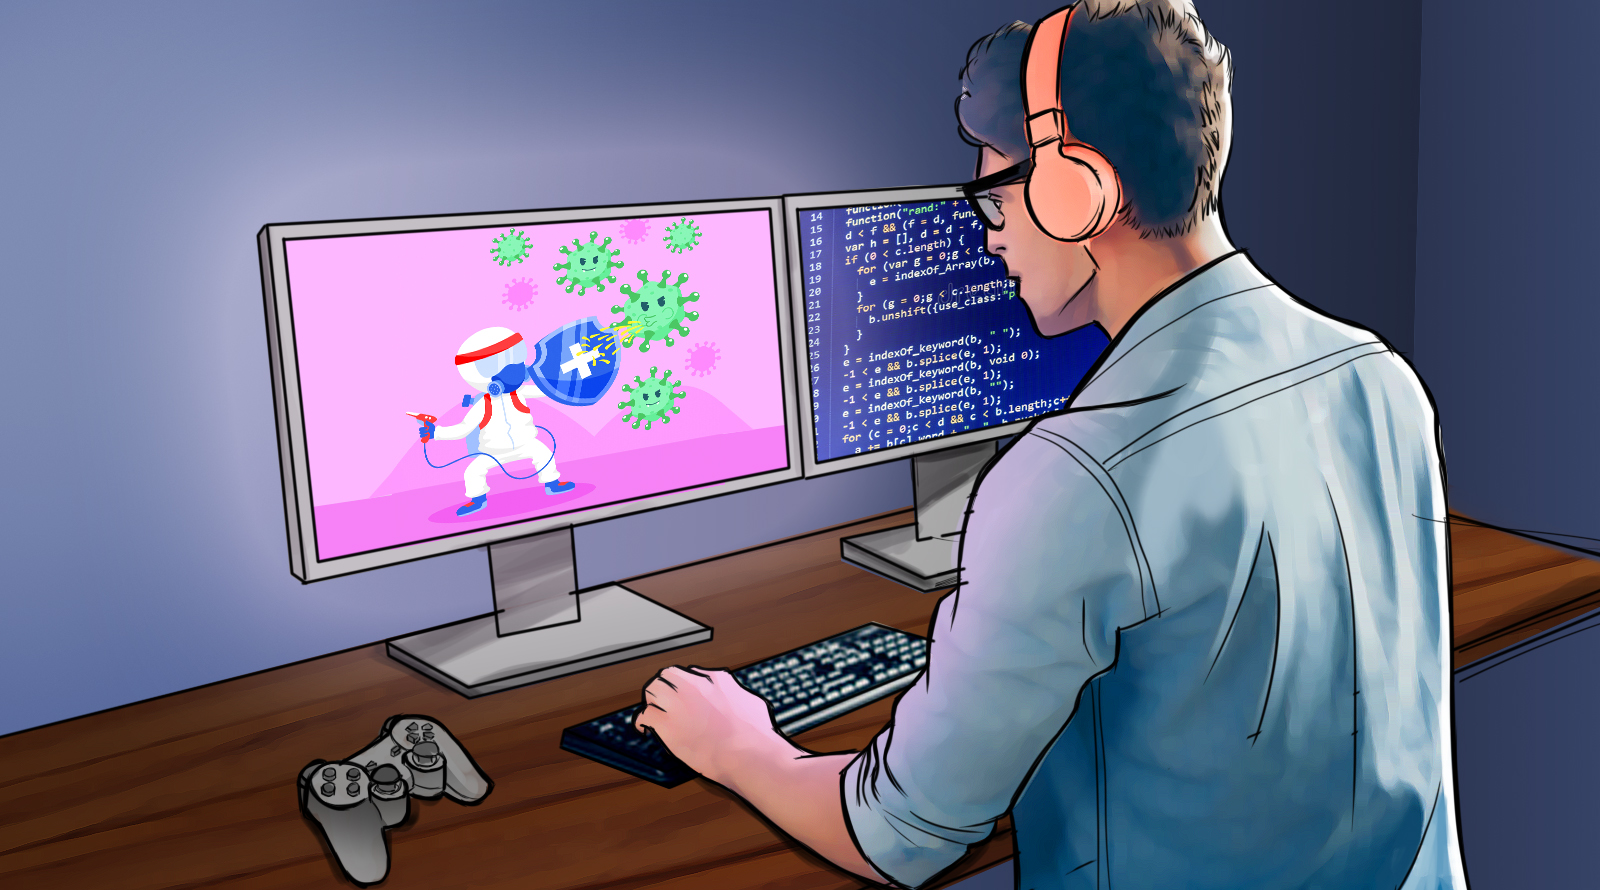 Estúdios de games jogam a fase pandemia